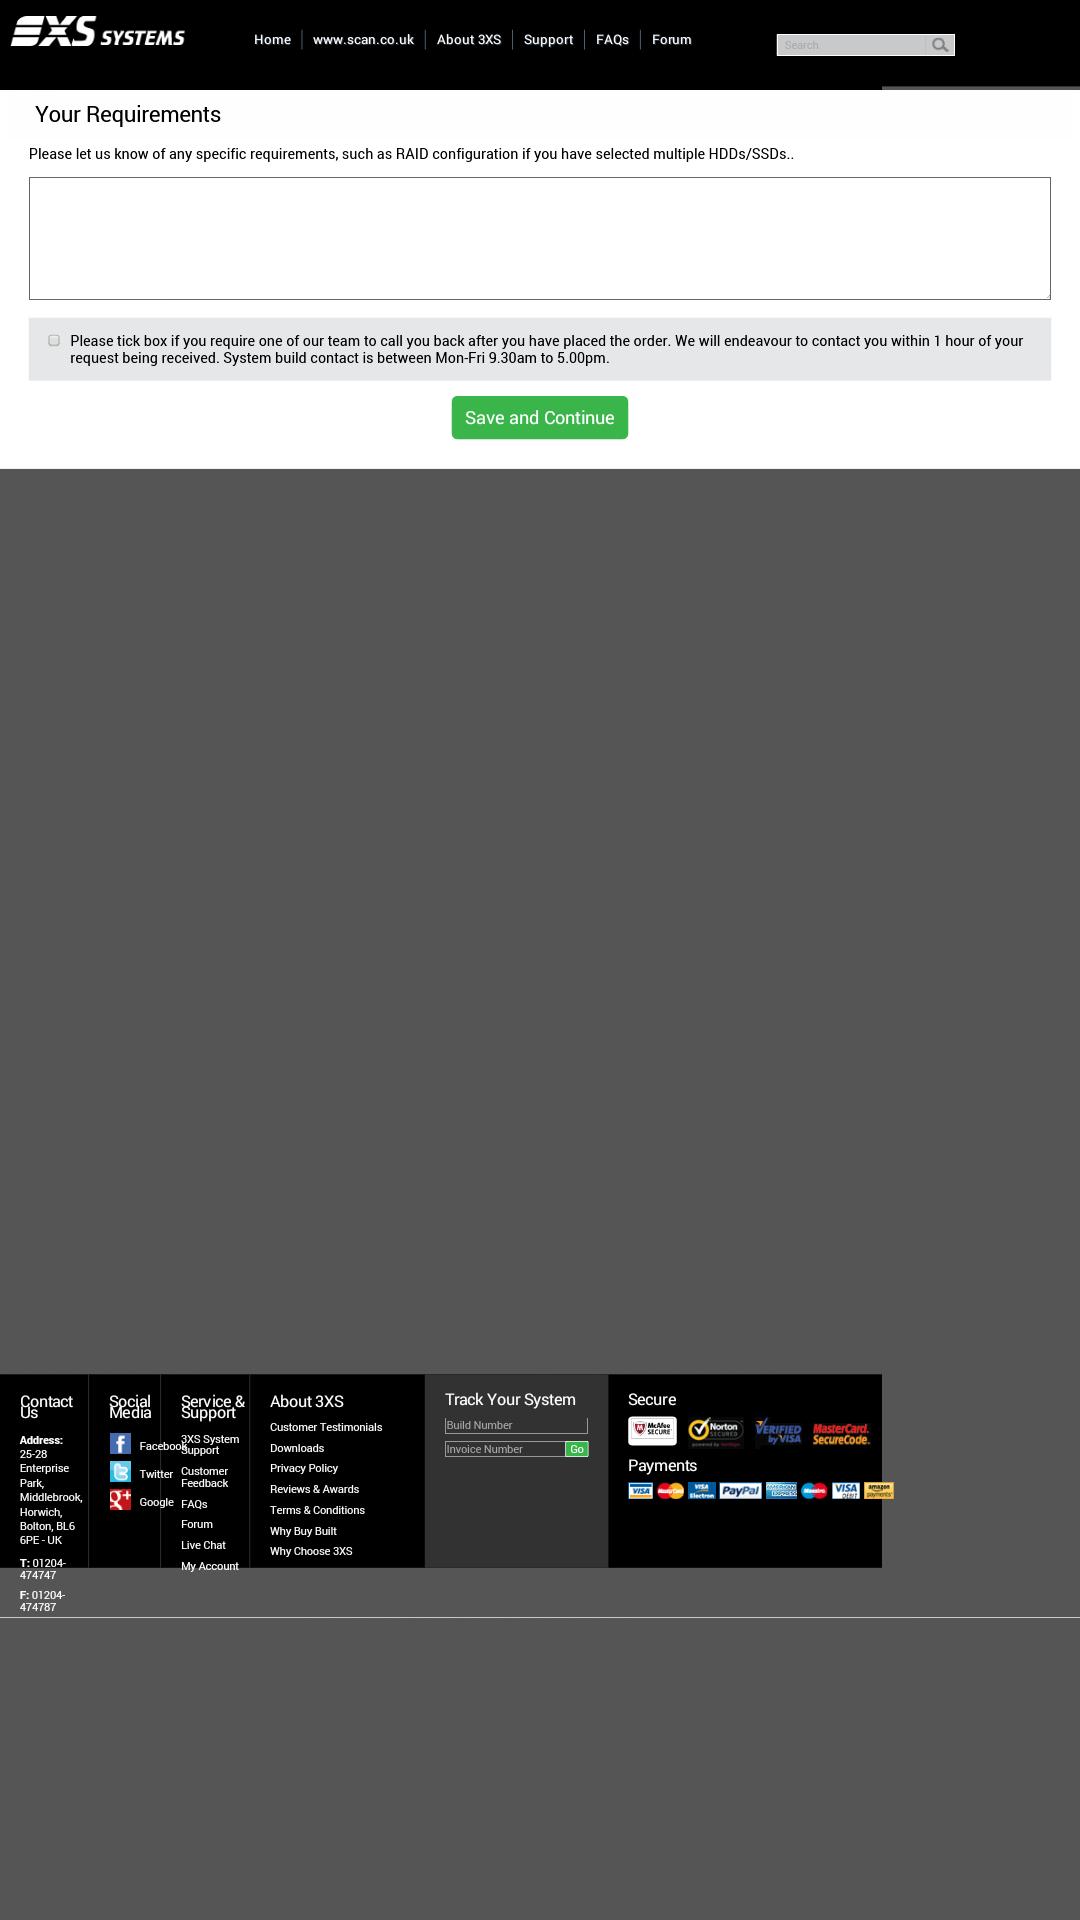 Screenshot_2014-12-19-22-19-22.png